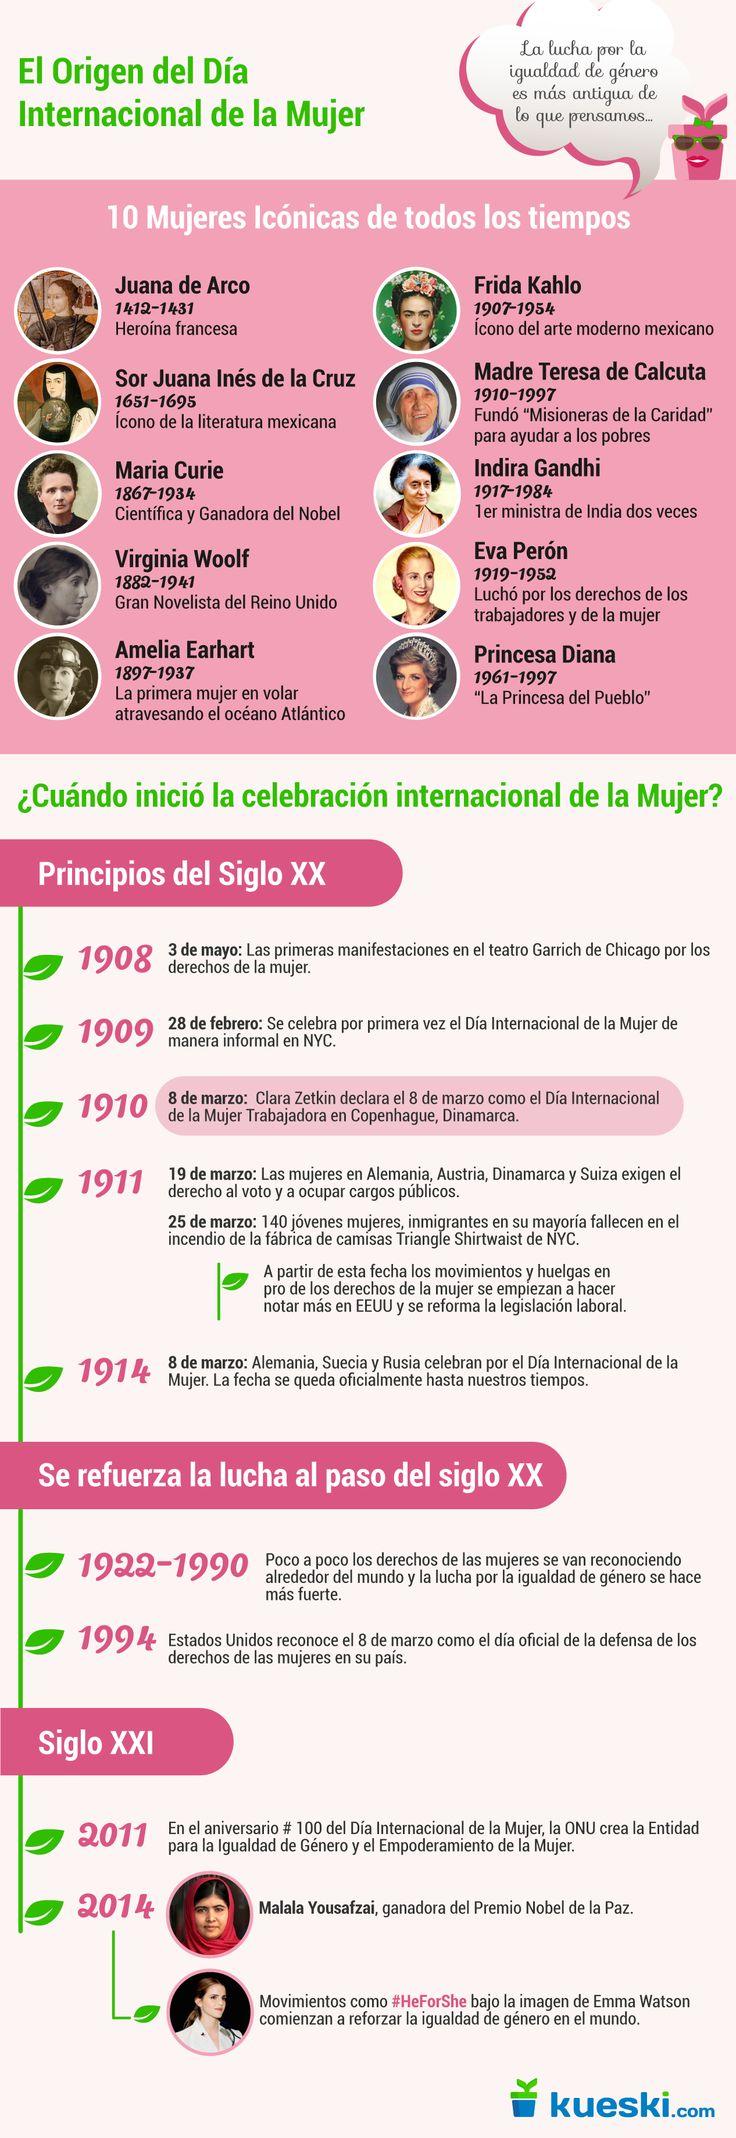 worksheet La Misma Luna Worksheet 1000 images about recursos on pinterest spanish learning internacional de la mujer conoce el origen este http